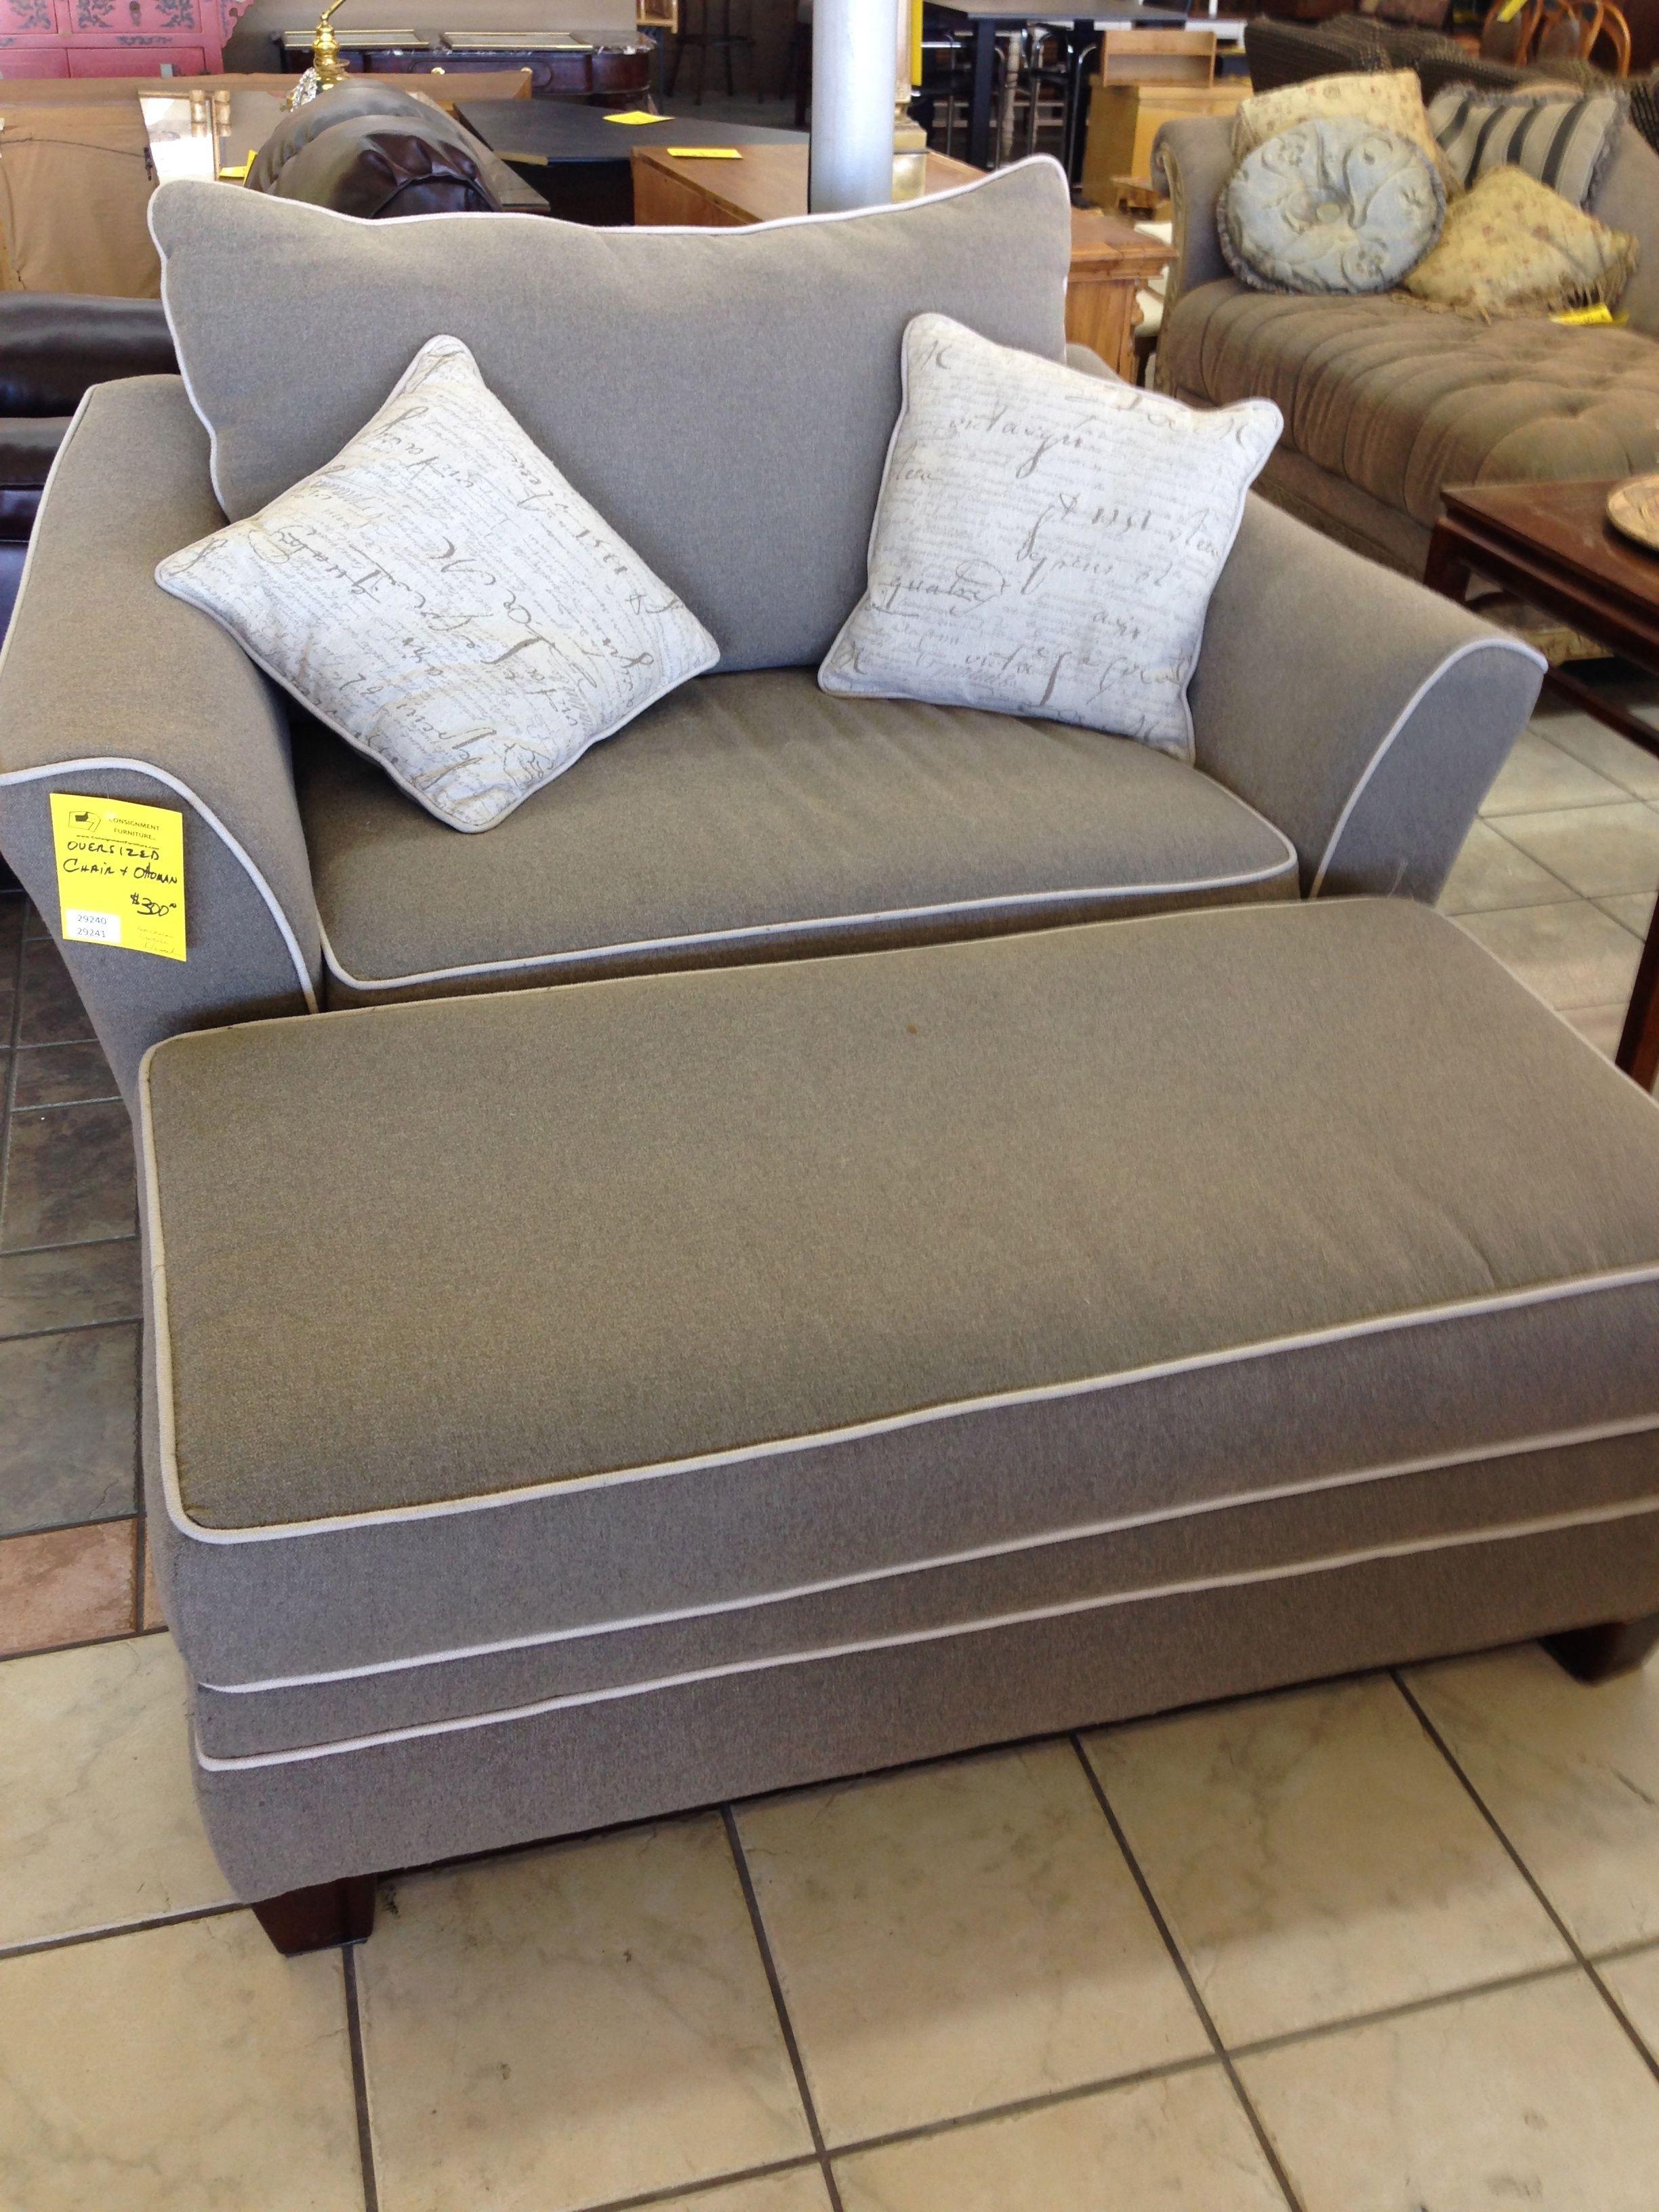 15+ Sofa, Sessel Und Hocker | Sofa | Pinterest Regarding Maddox Oversized Sofa Chairs (Image 1 of 20)